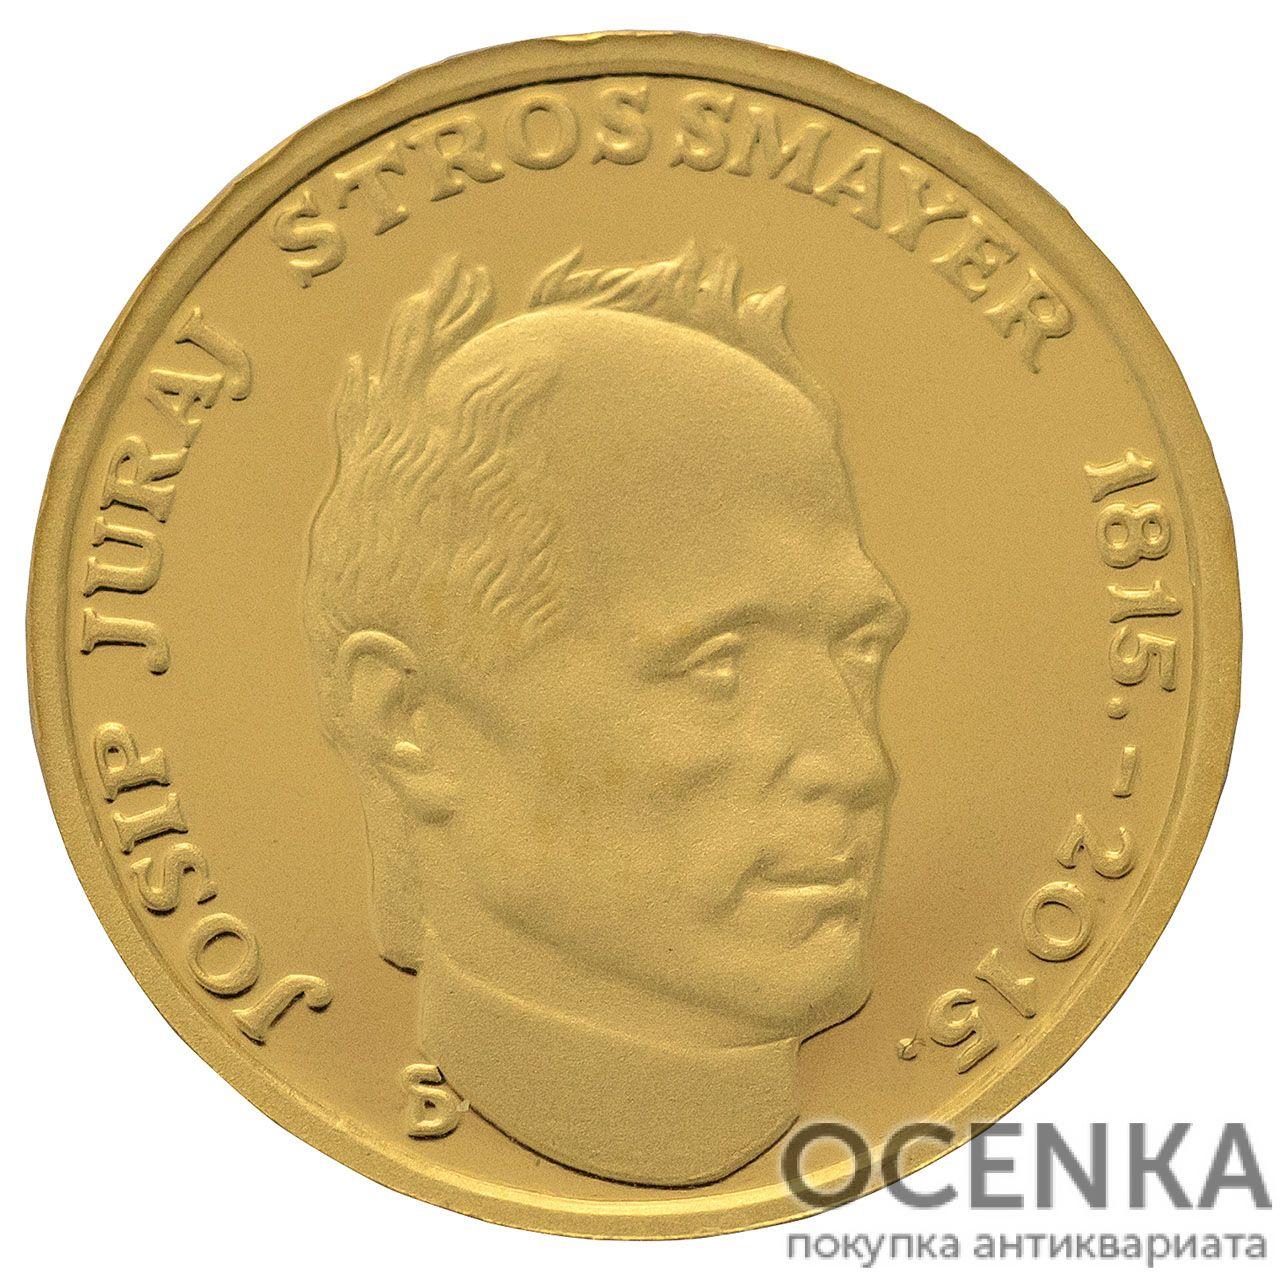 Золотая монета 20 Кун (20 Kuna) Хорватия - 1